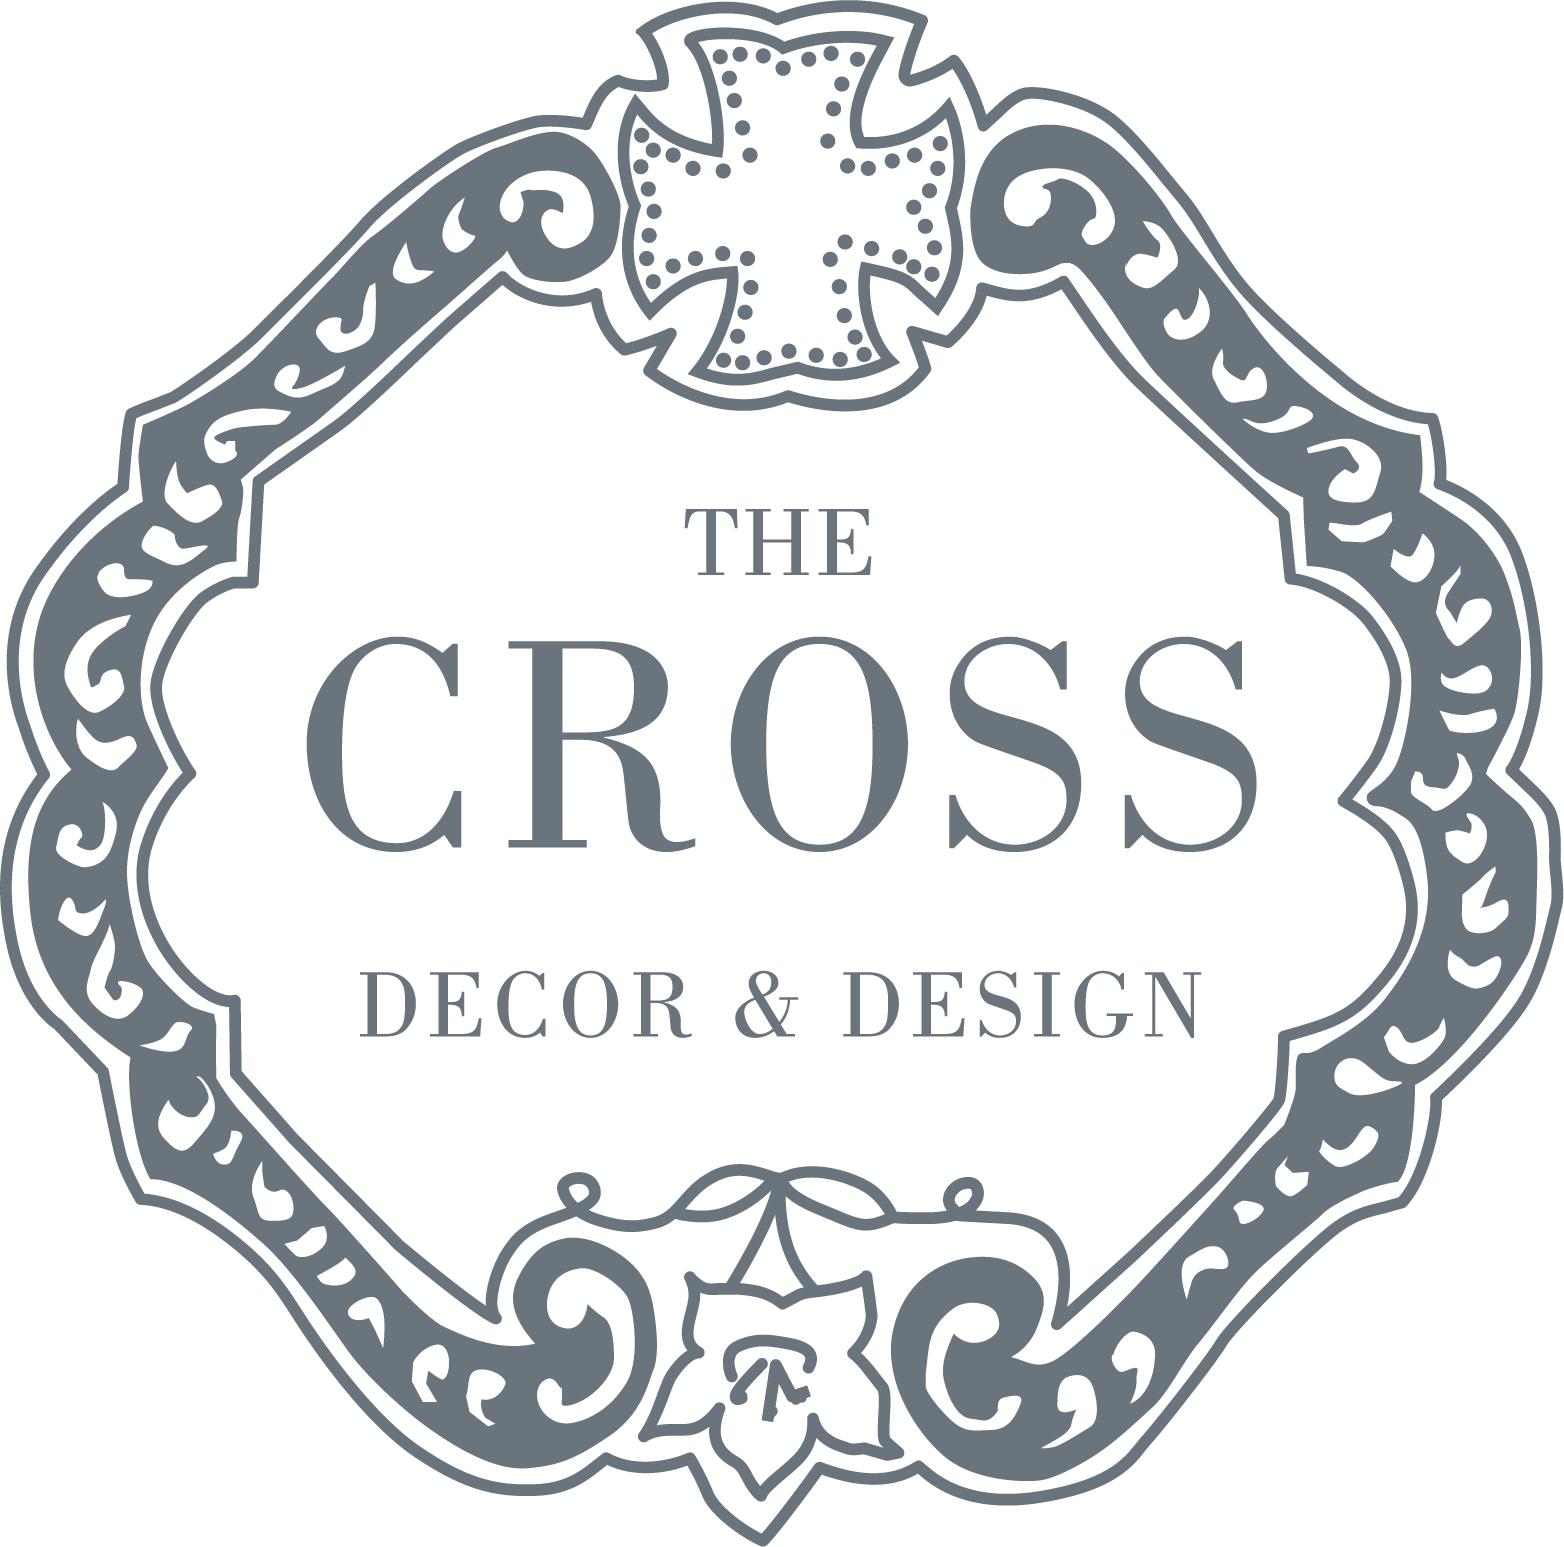 thecross.jpg